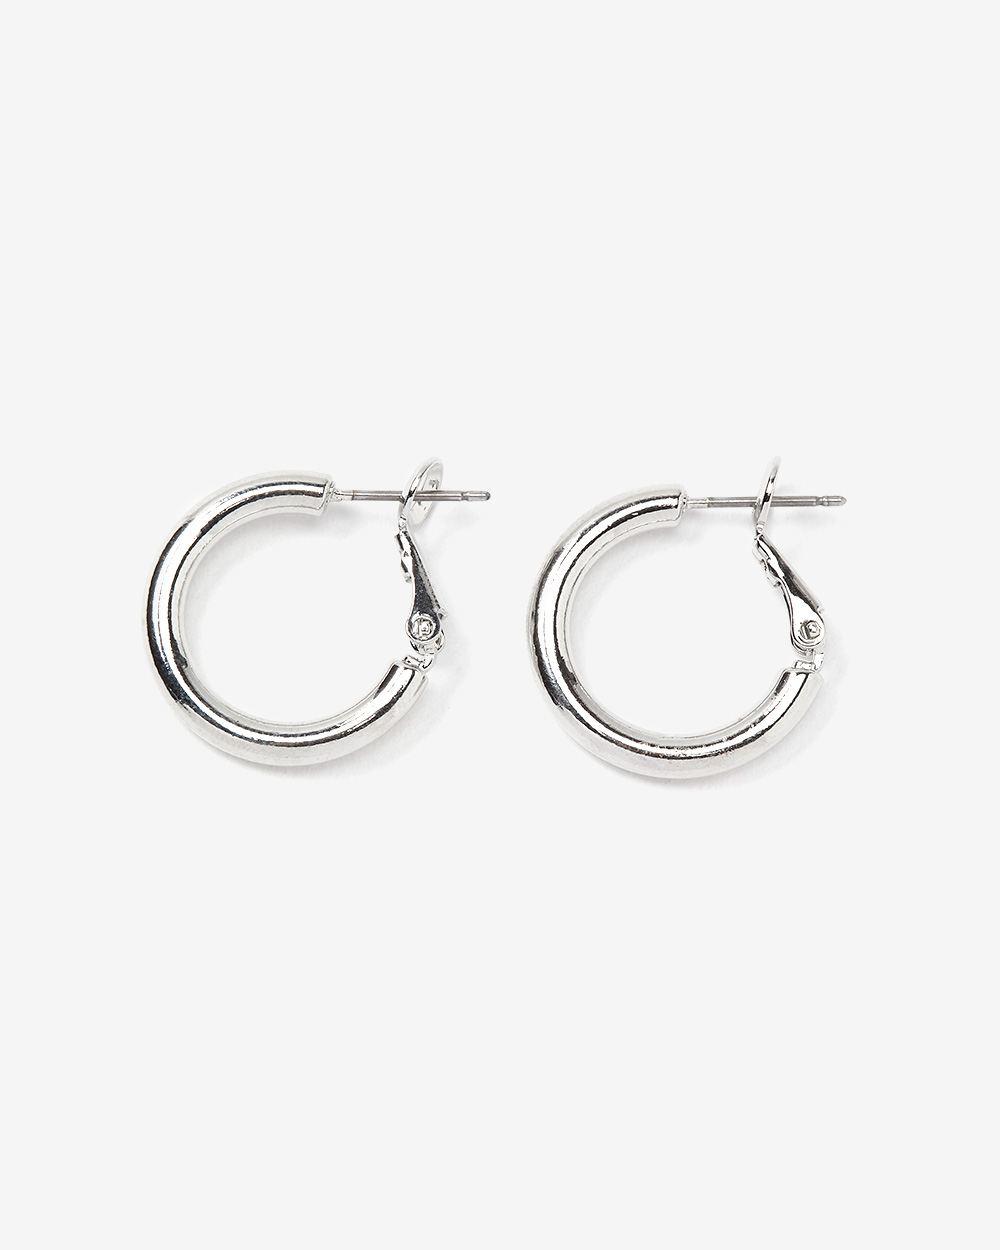 Small Silver Hoop Earrings